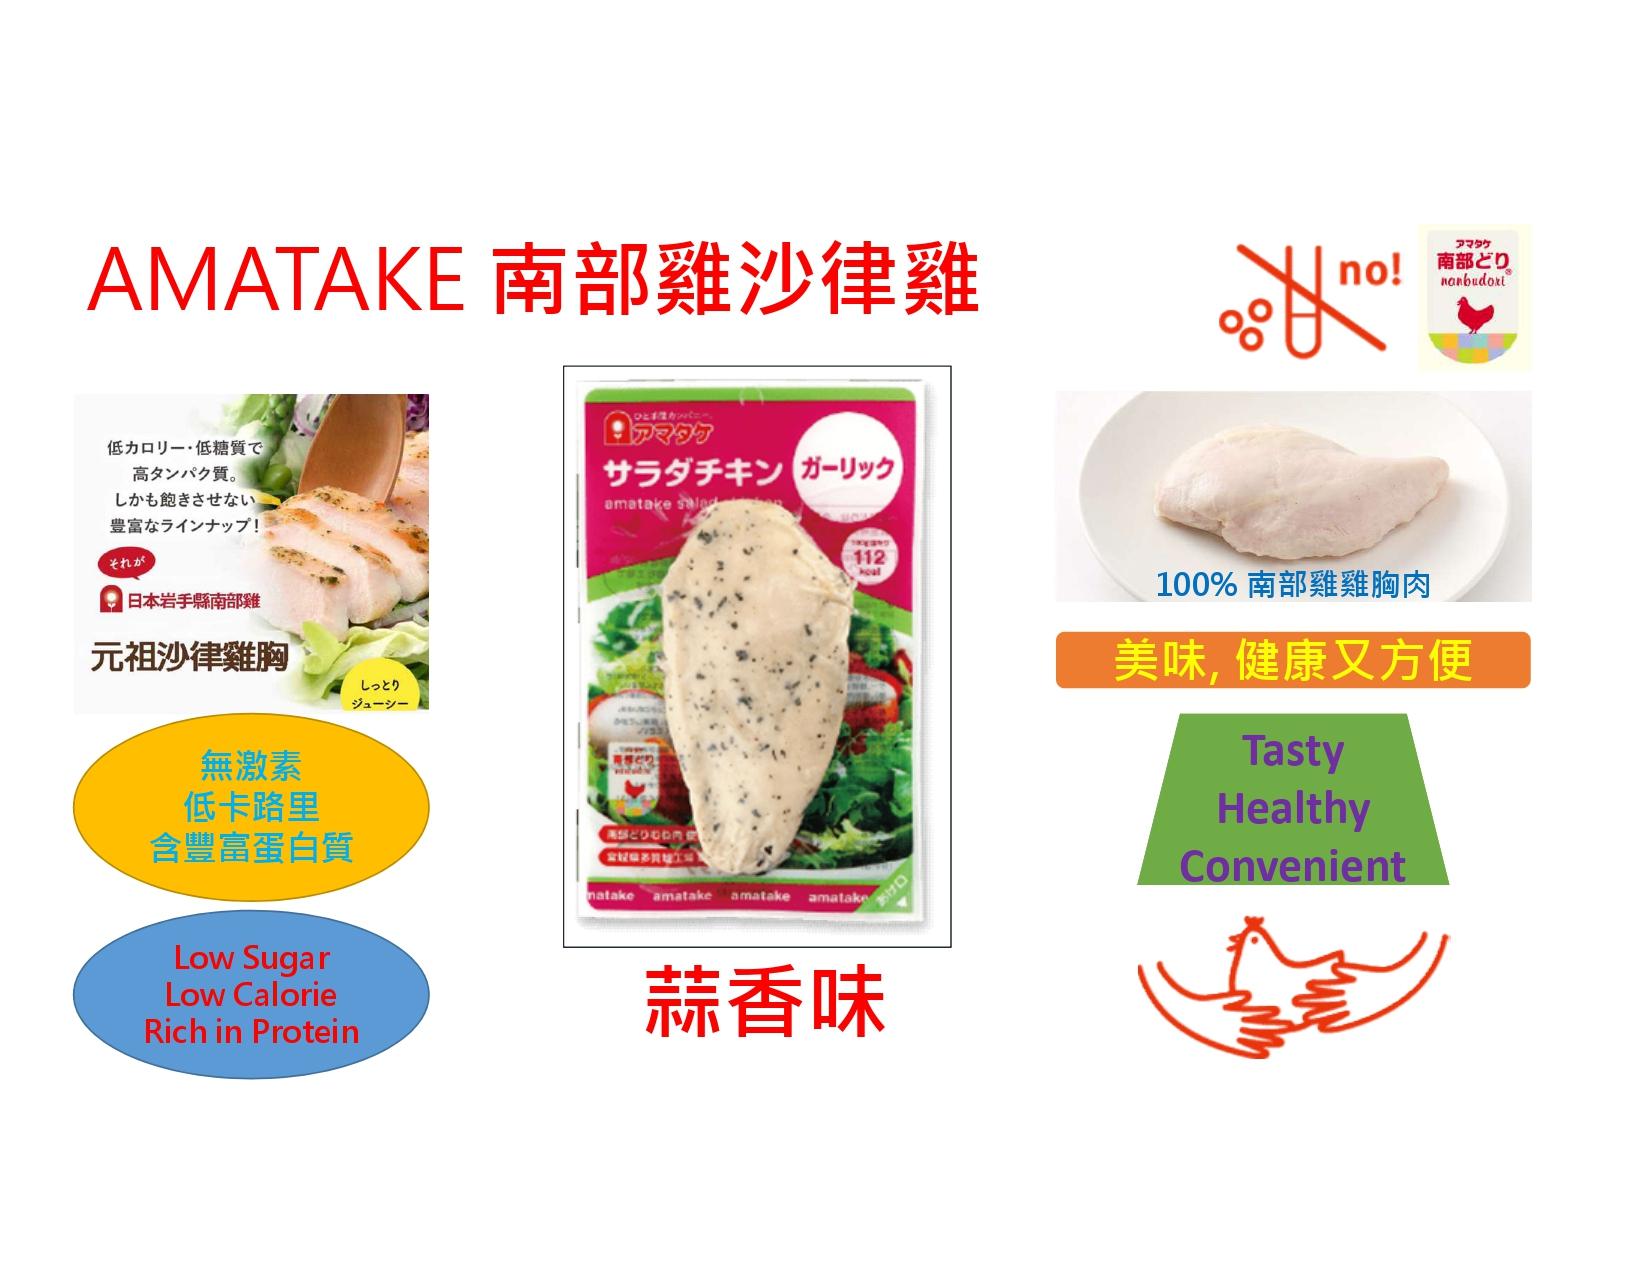 南部雞沙律雞 店鋪 CATALOG (29-08-20)_page-0006